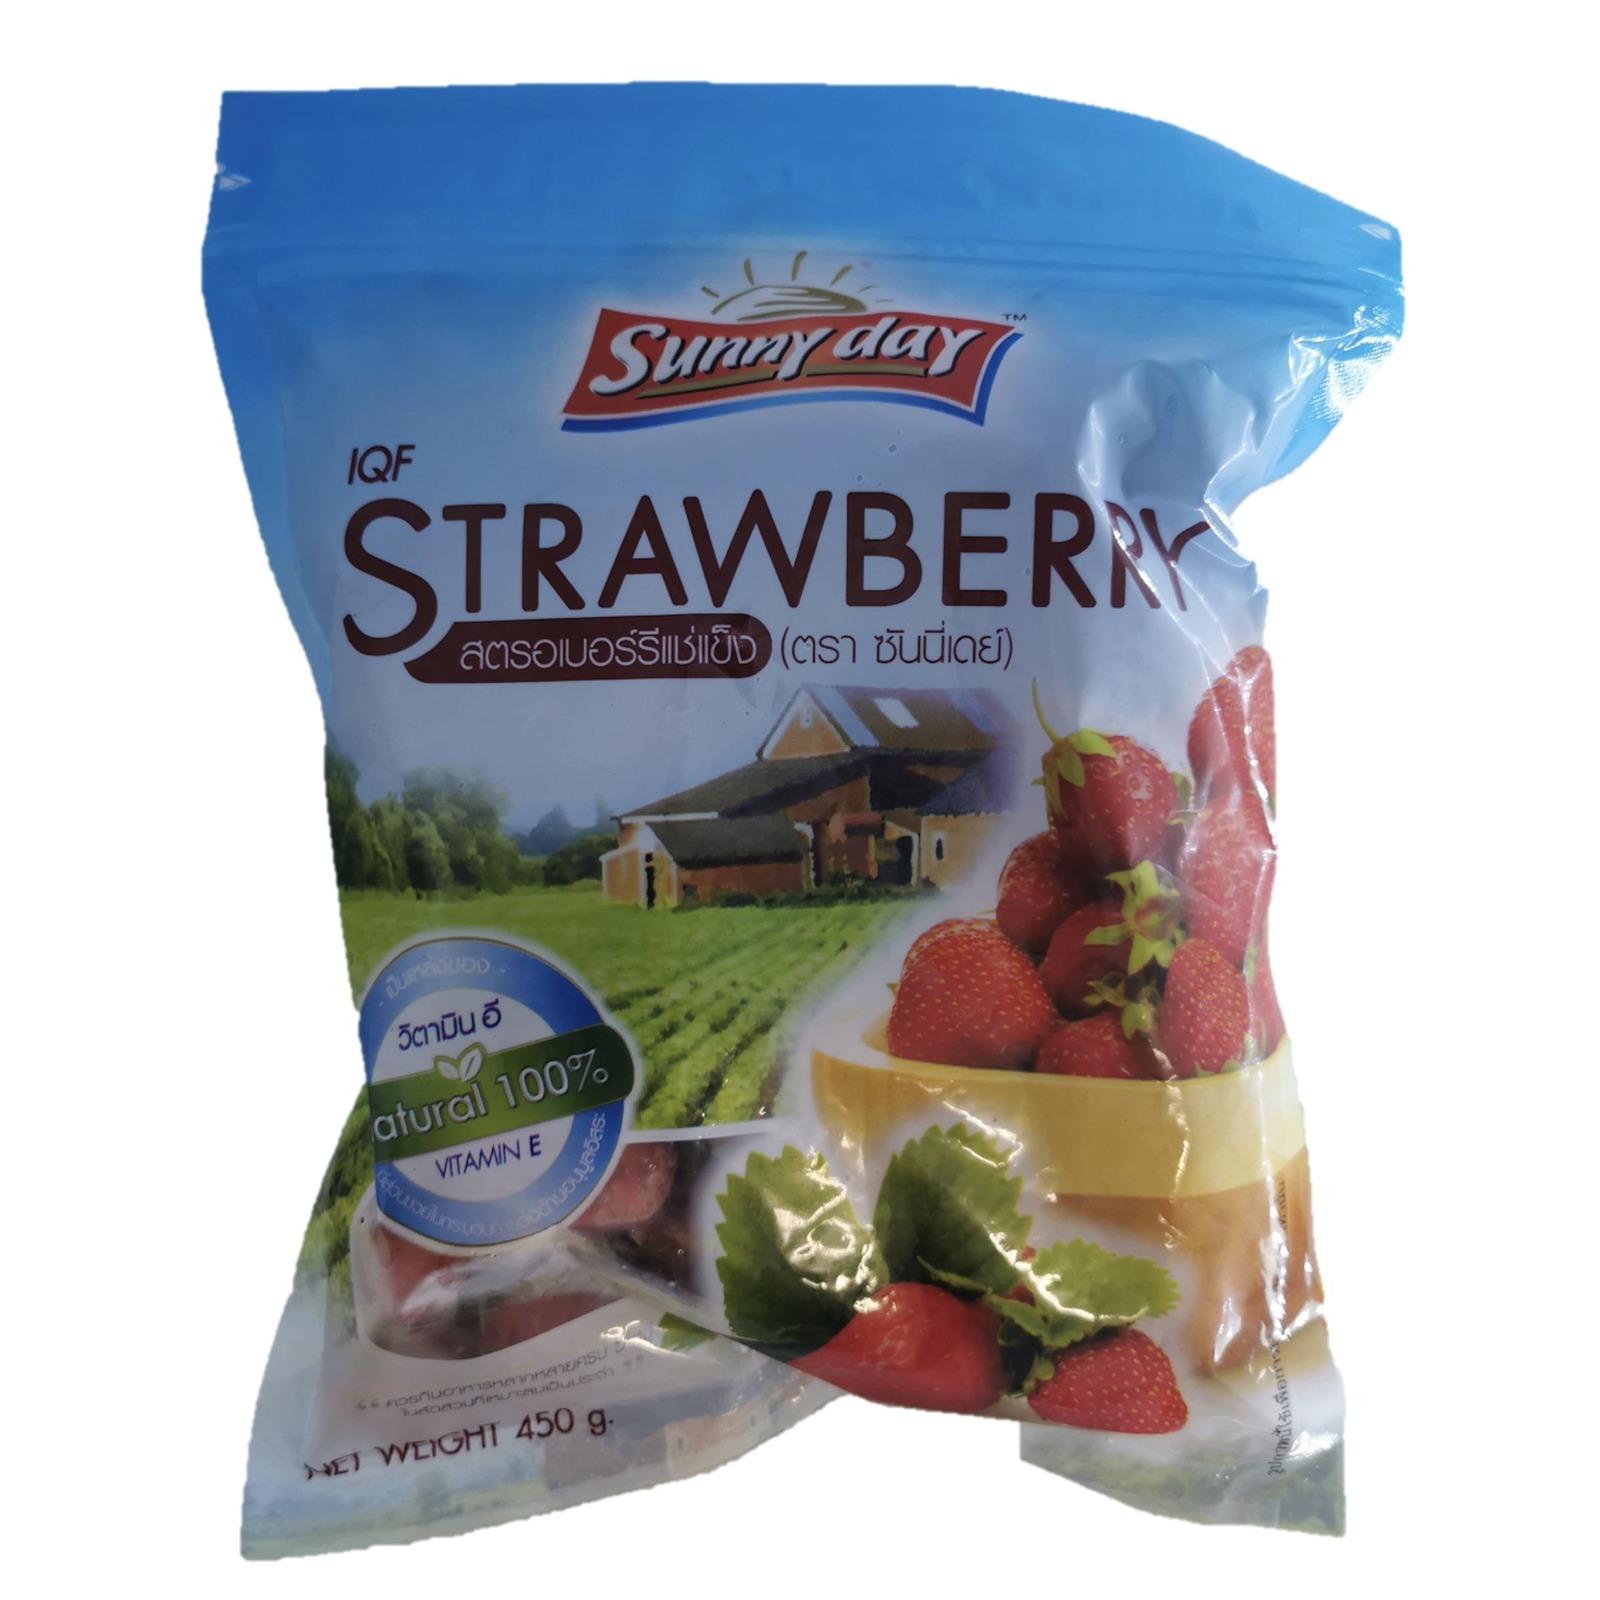 Sunny Days IQF Strawberry